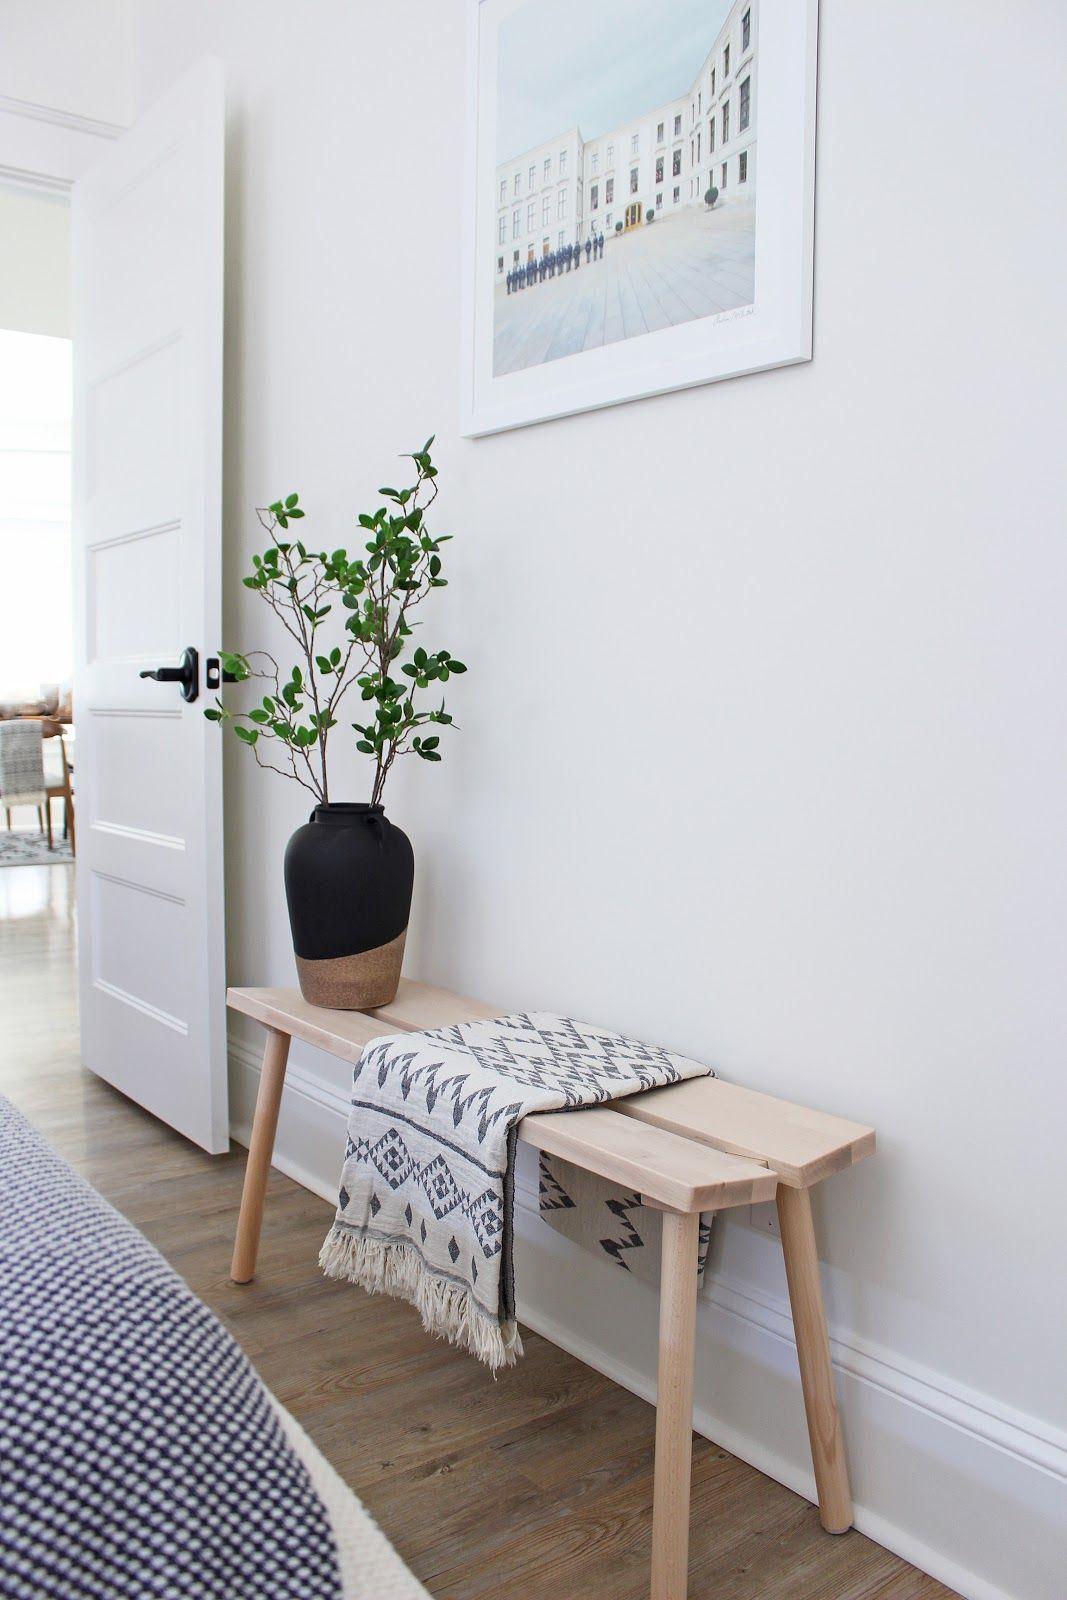 7 Scandinavian Design Principles And How To Use Them Scandinaviankitchenwitch Scan Scandinavian Style Home Bedroom Furniture Design Living Room Scandinavian